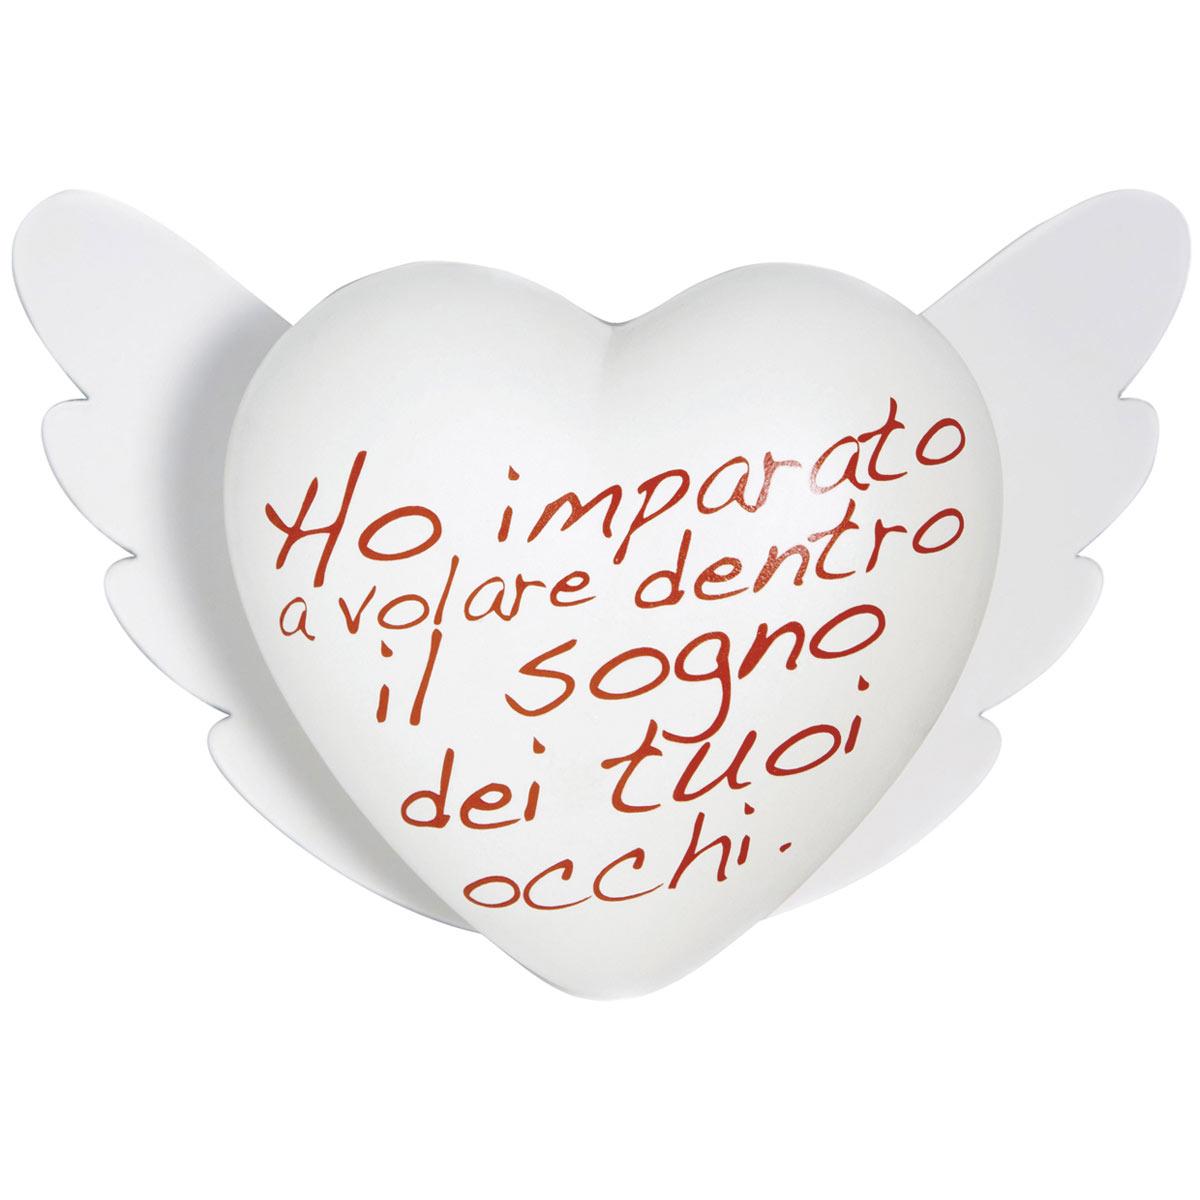 HEART GALLERY -ACQUISTA ONLINE Image